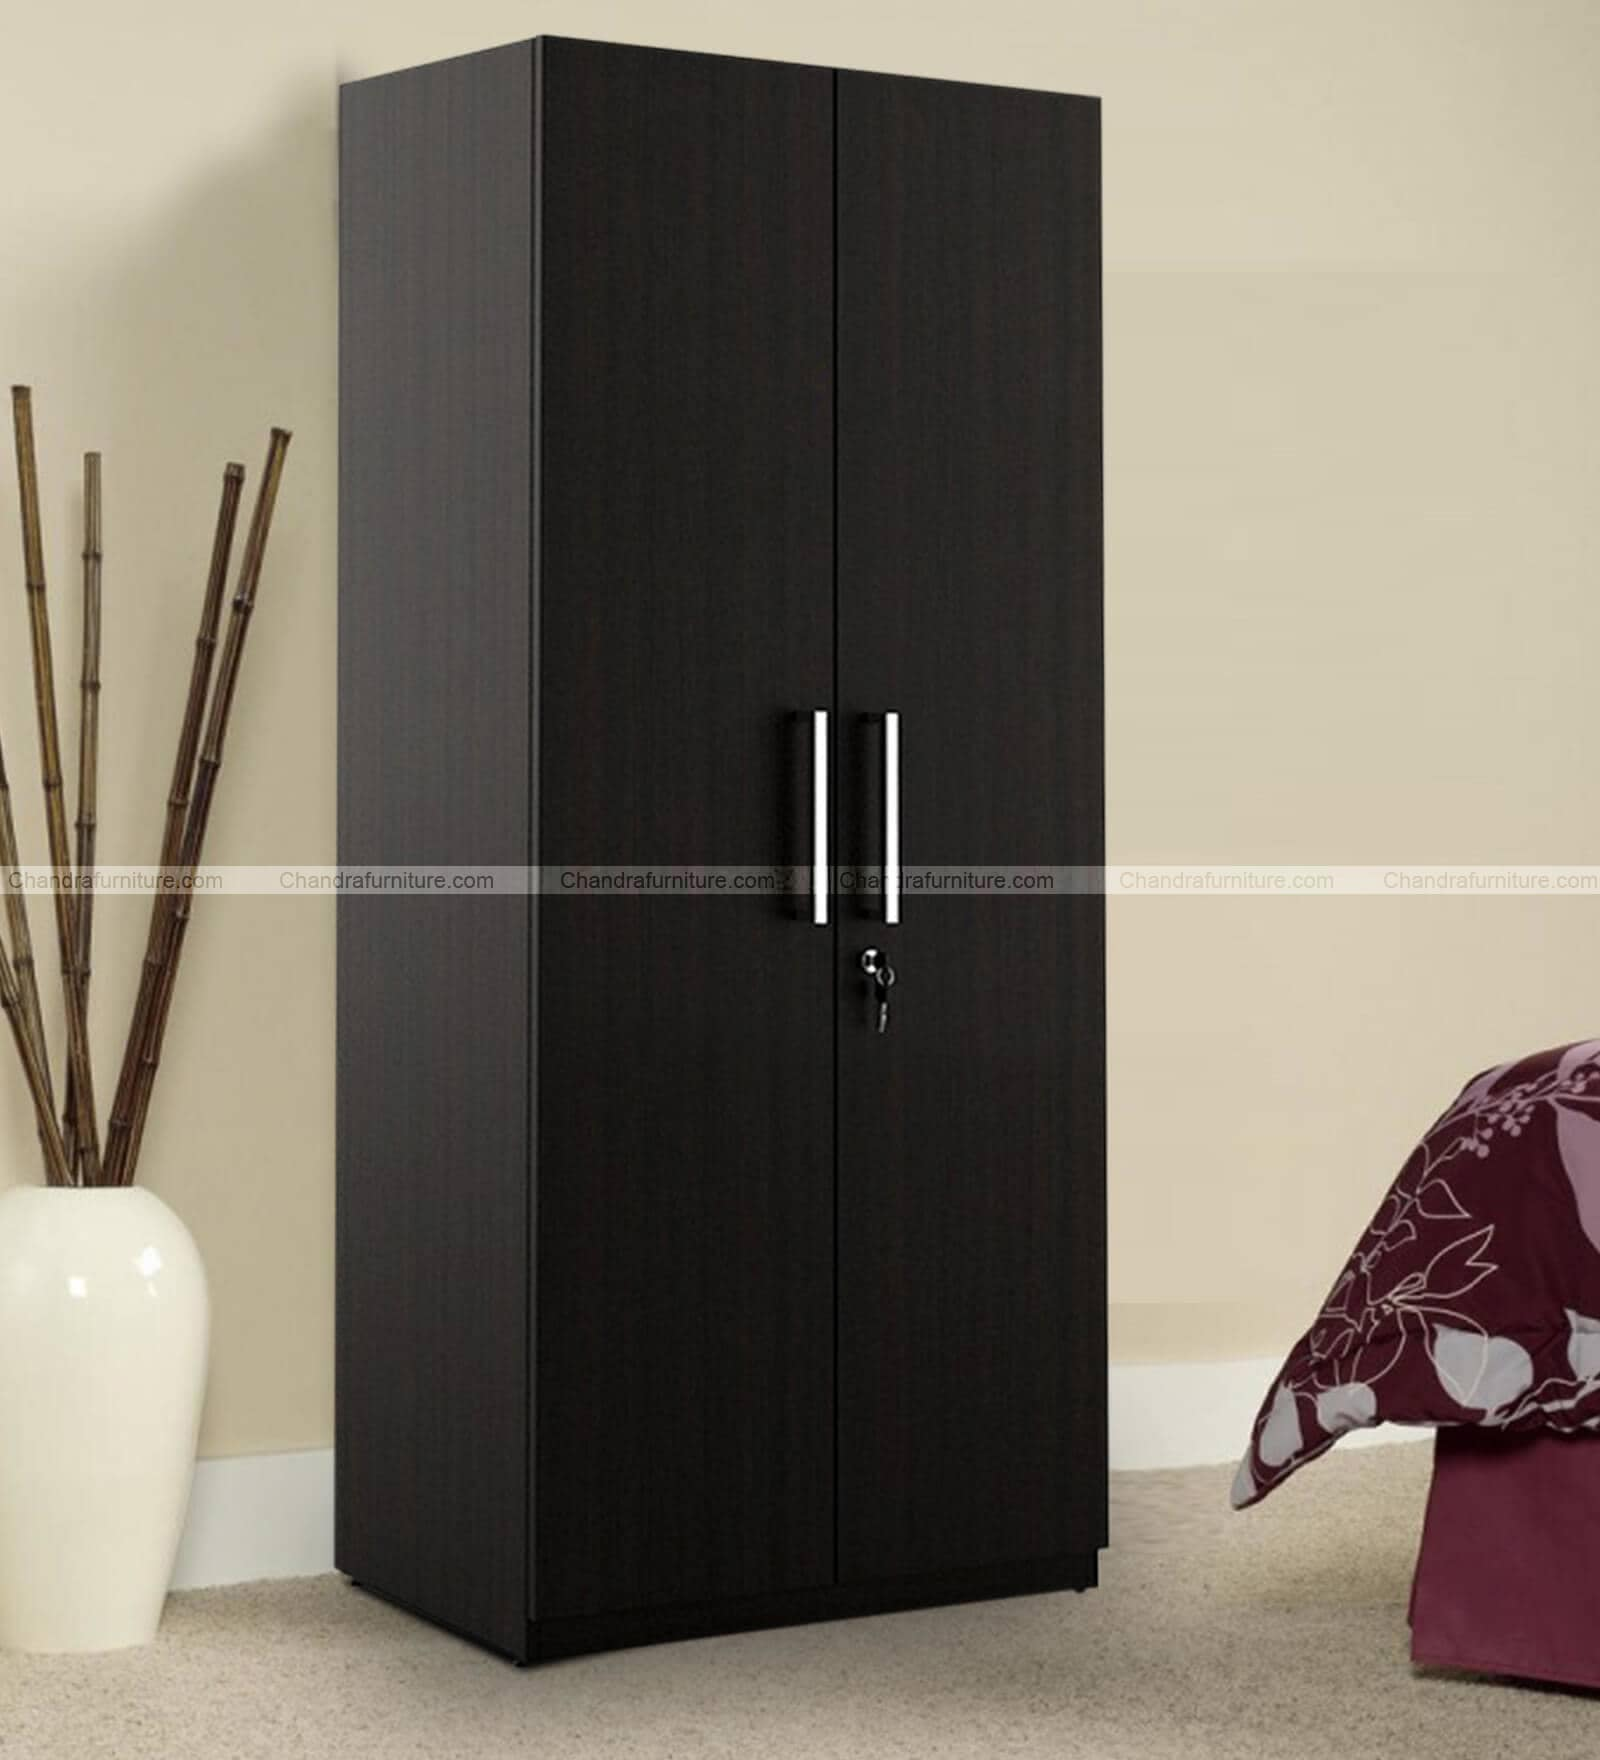 Chandra Furniture Eco Two Door Wardrobe Dark Colour